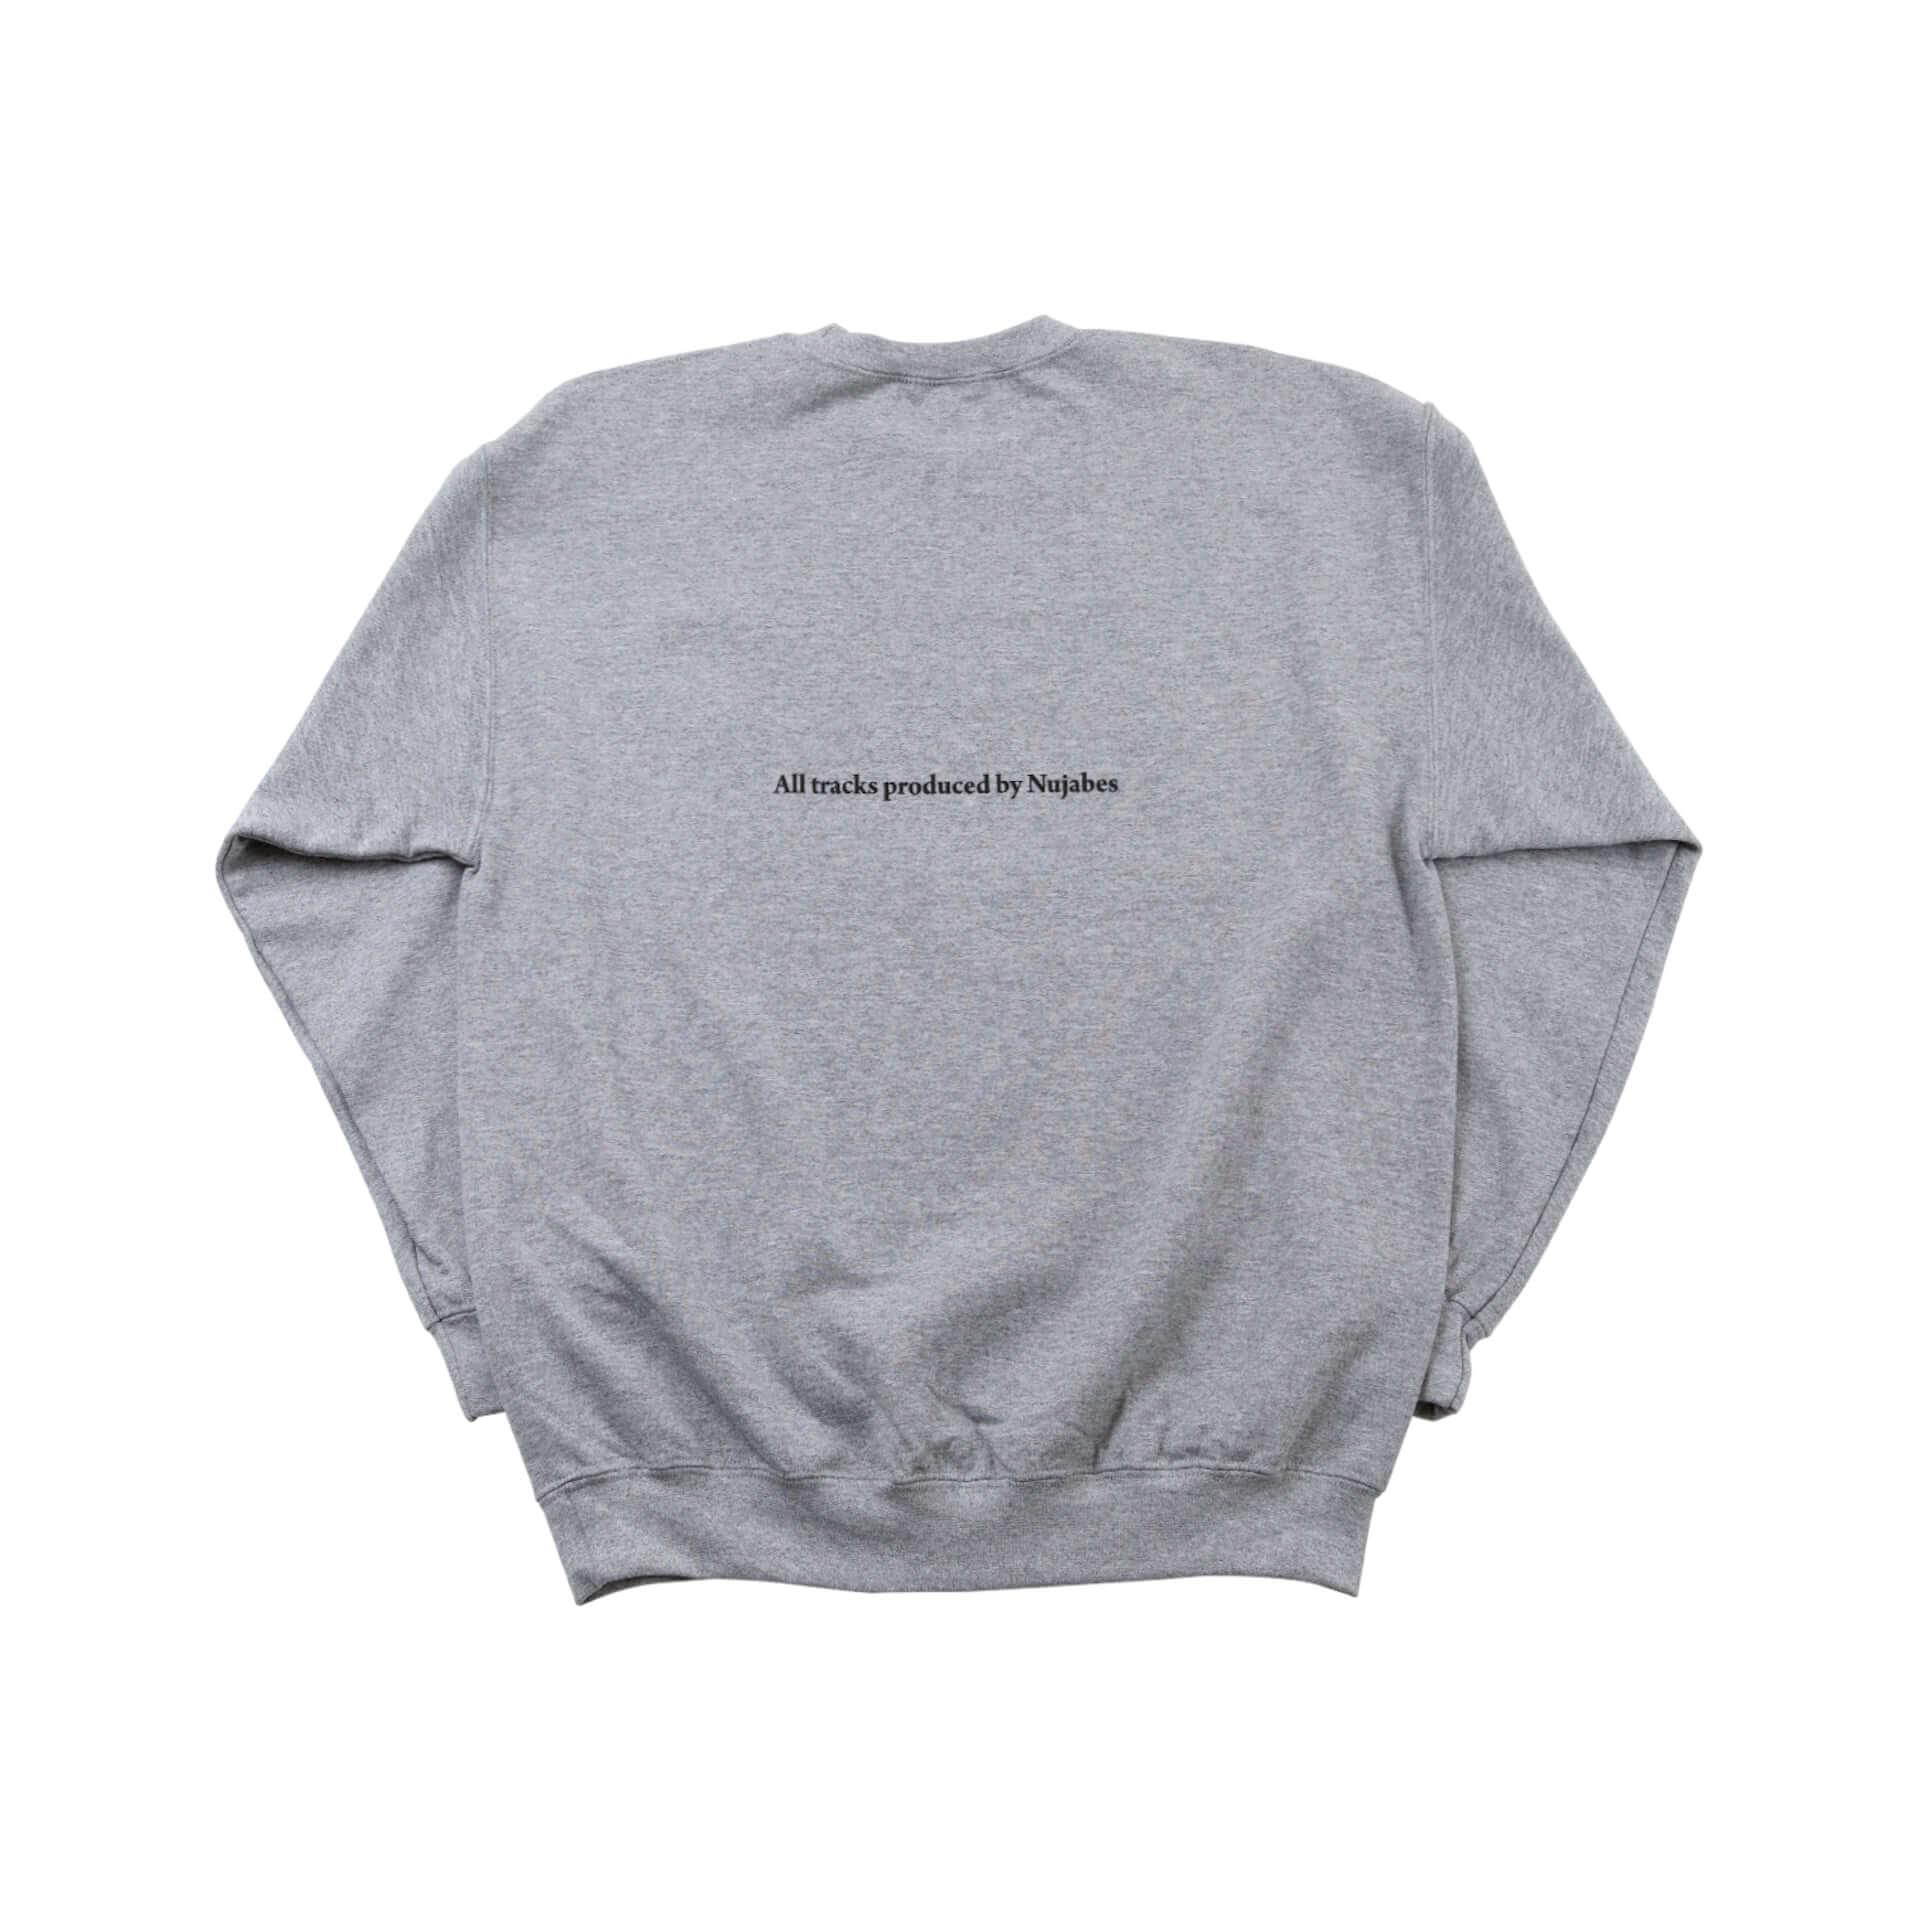 Nujabesの名盤『metaphorical music』ジャケットが施されたTシャツやフーディーなど続々登場!ポップアップ最新グッズの予約受付が開始 lf210205_nujabes_1-1920x1920